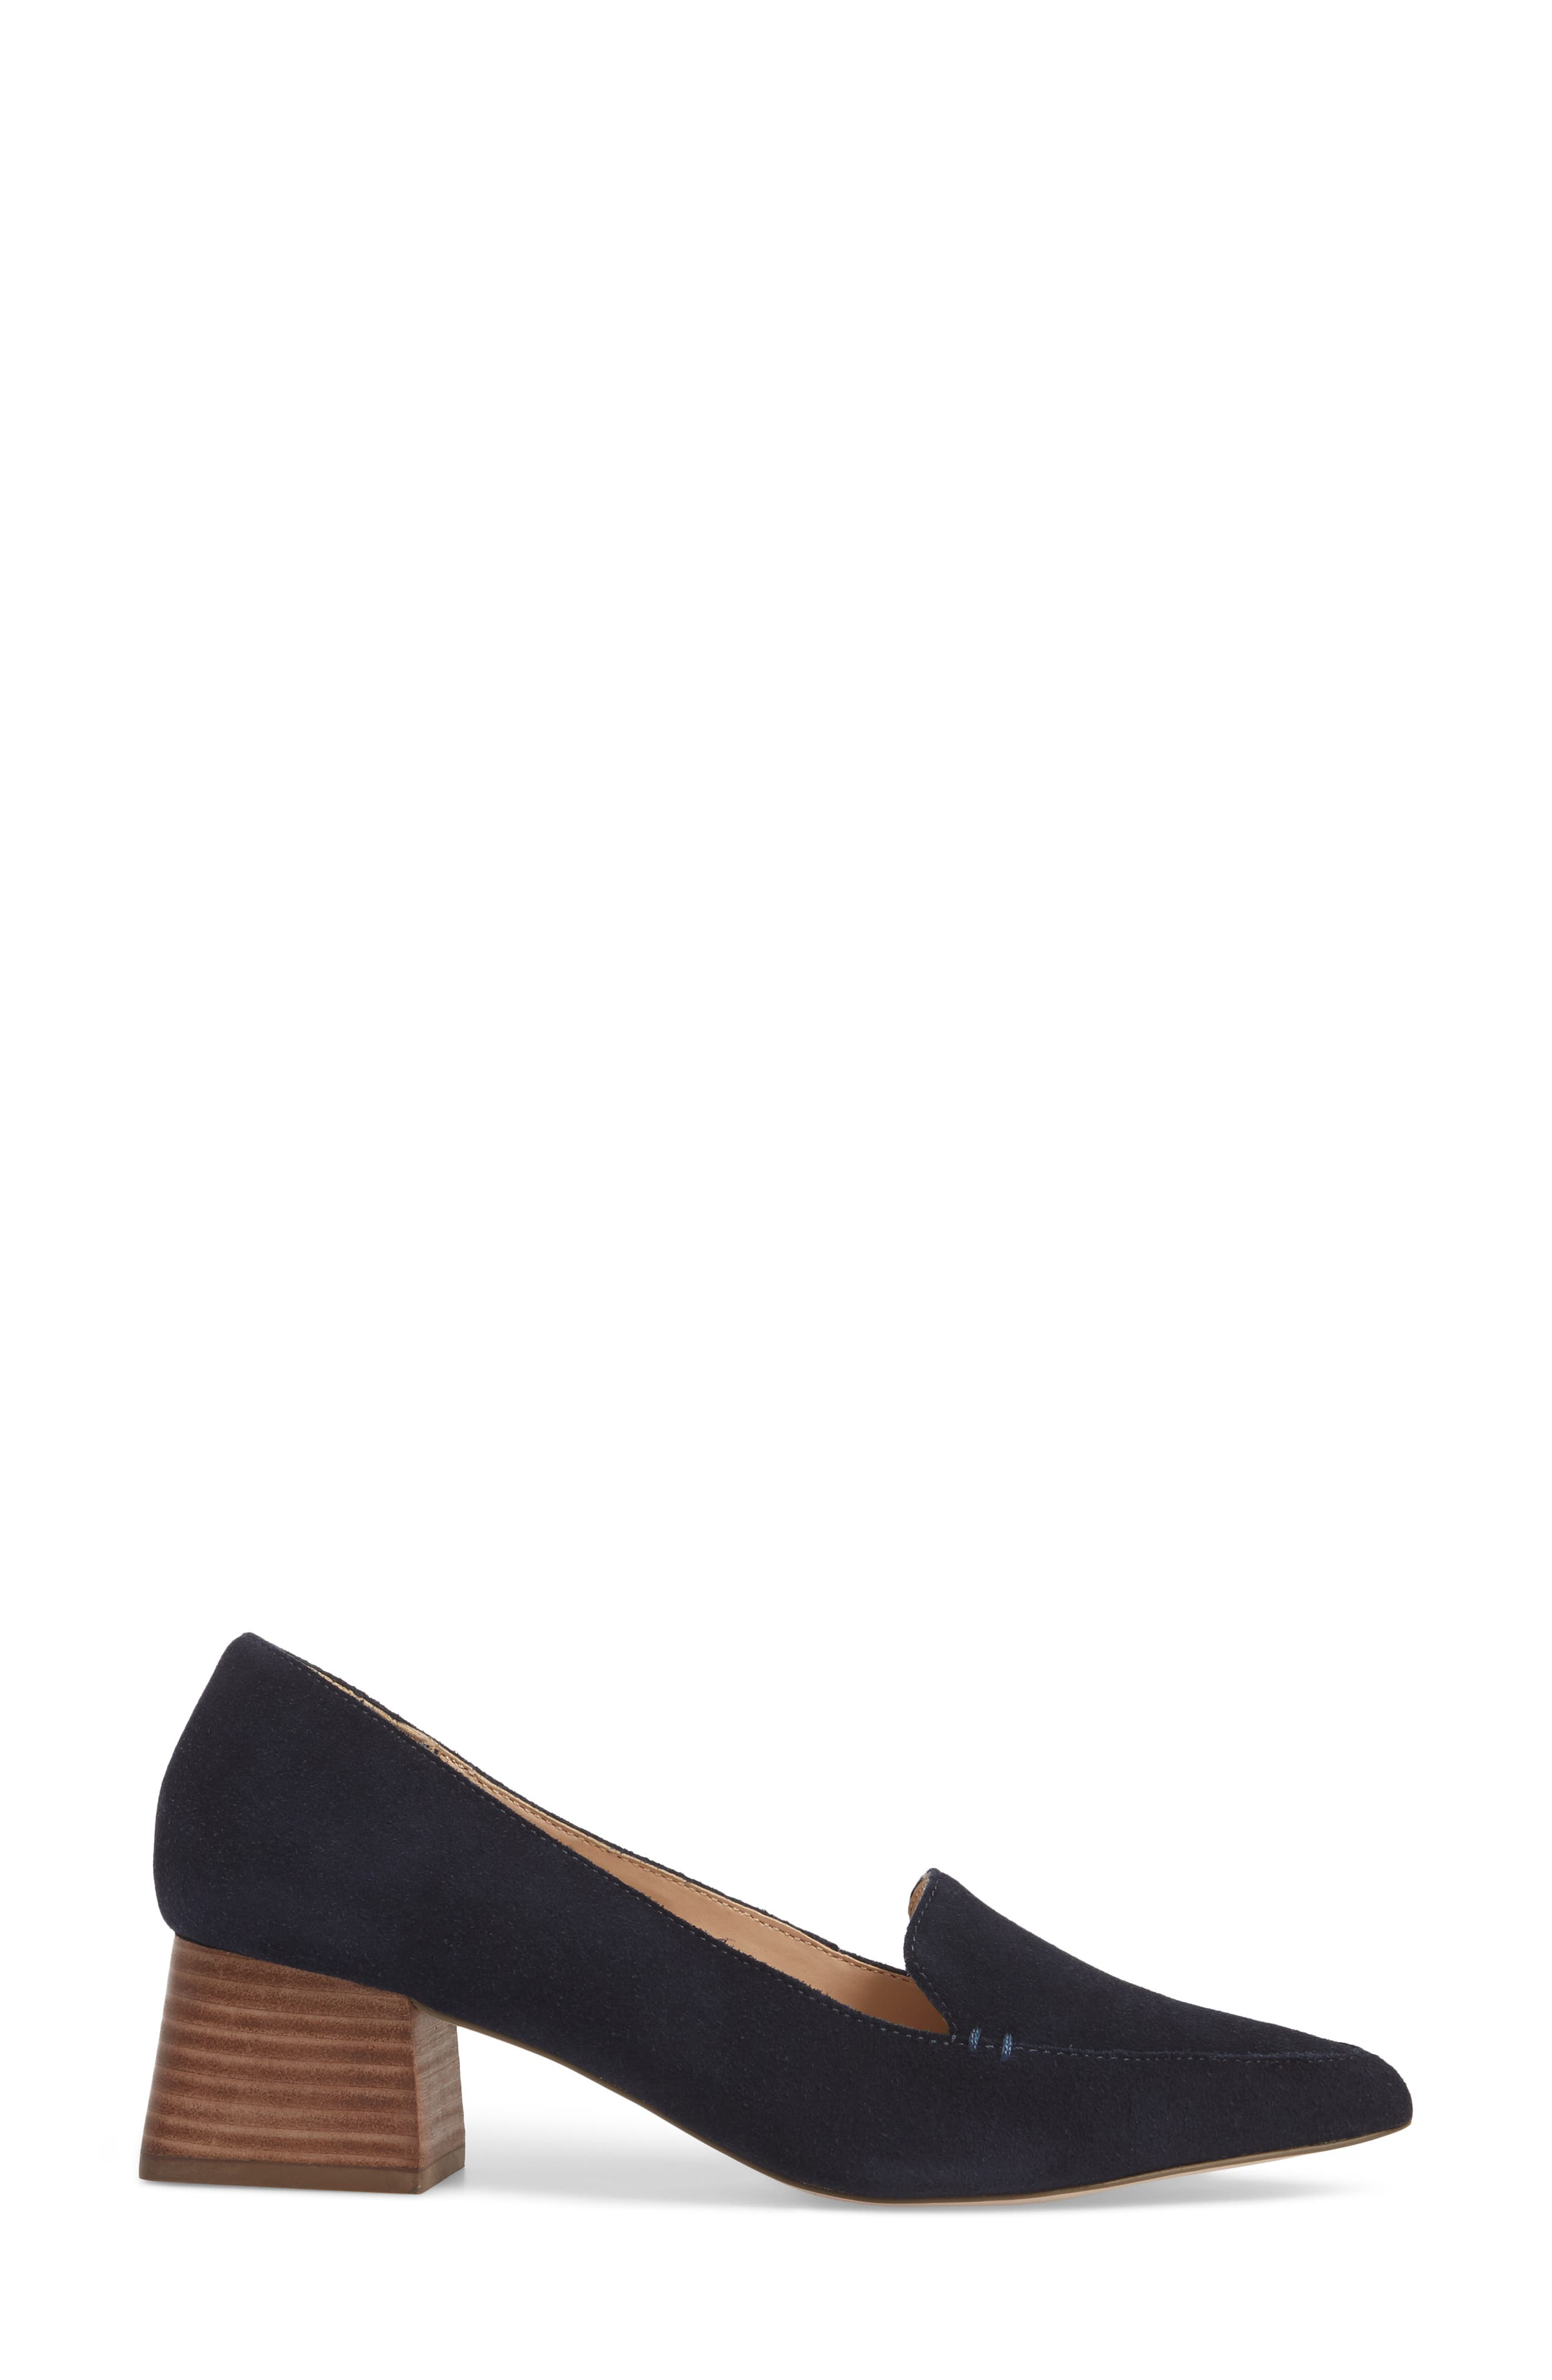 SOLE SOCIETY, Mavis Flare Heel Loafer, Alternate thumbnail 3, color, OMBRE BLUE